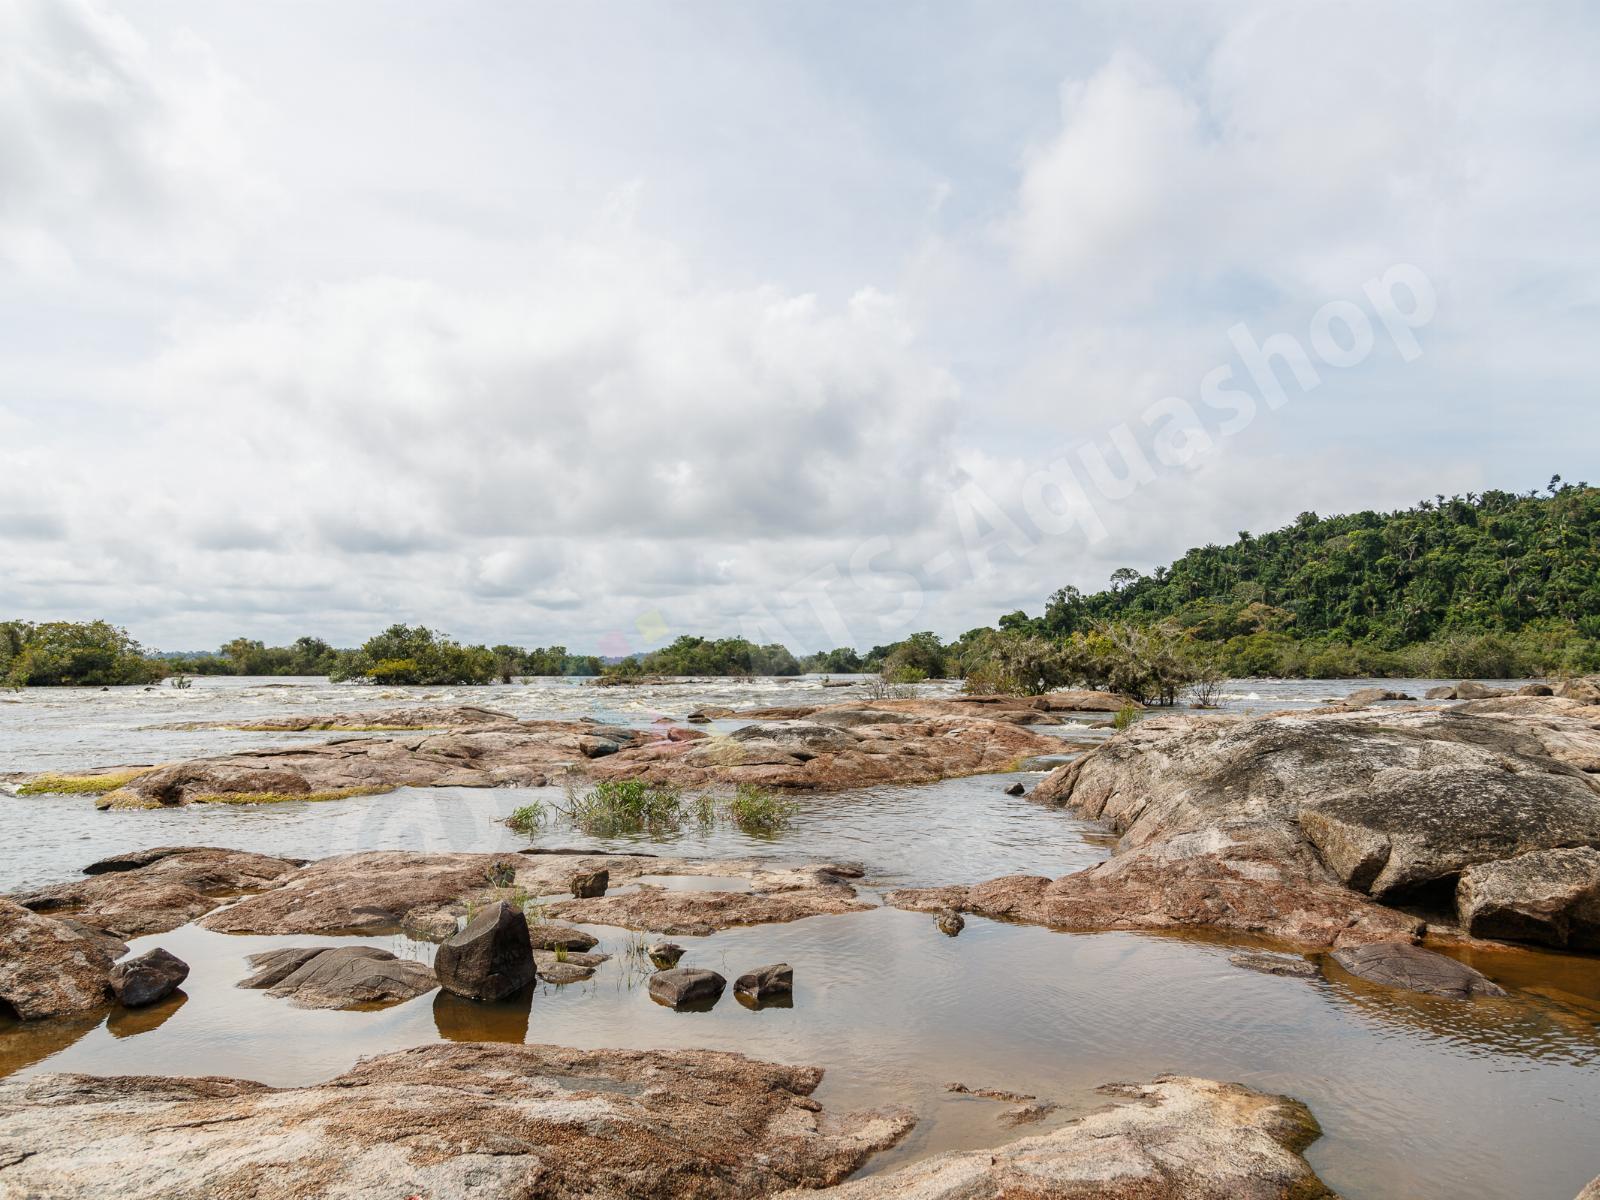 rio xingu  cachoeira do jericoa  andreas tanke 0195 8